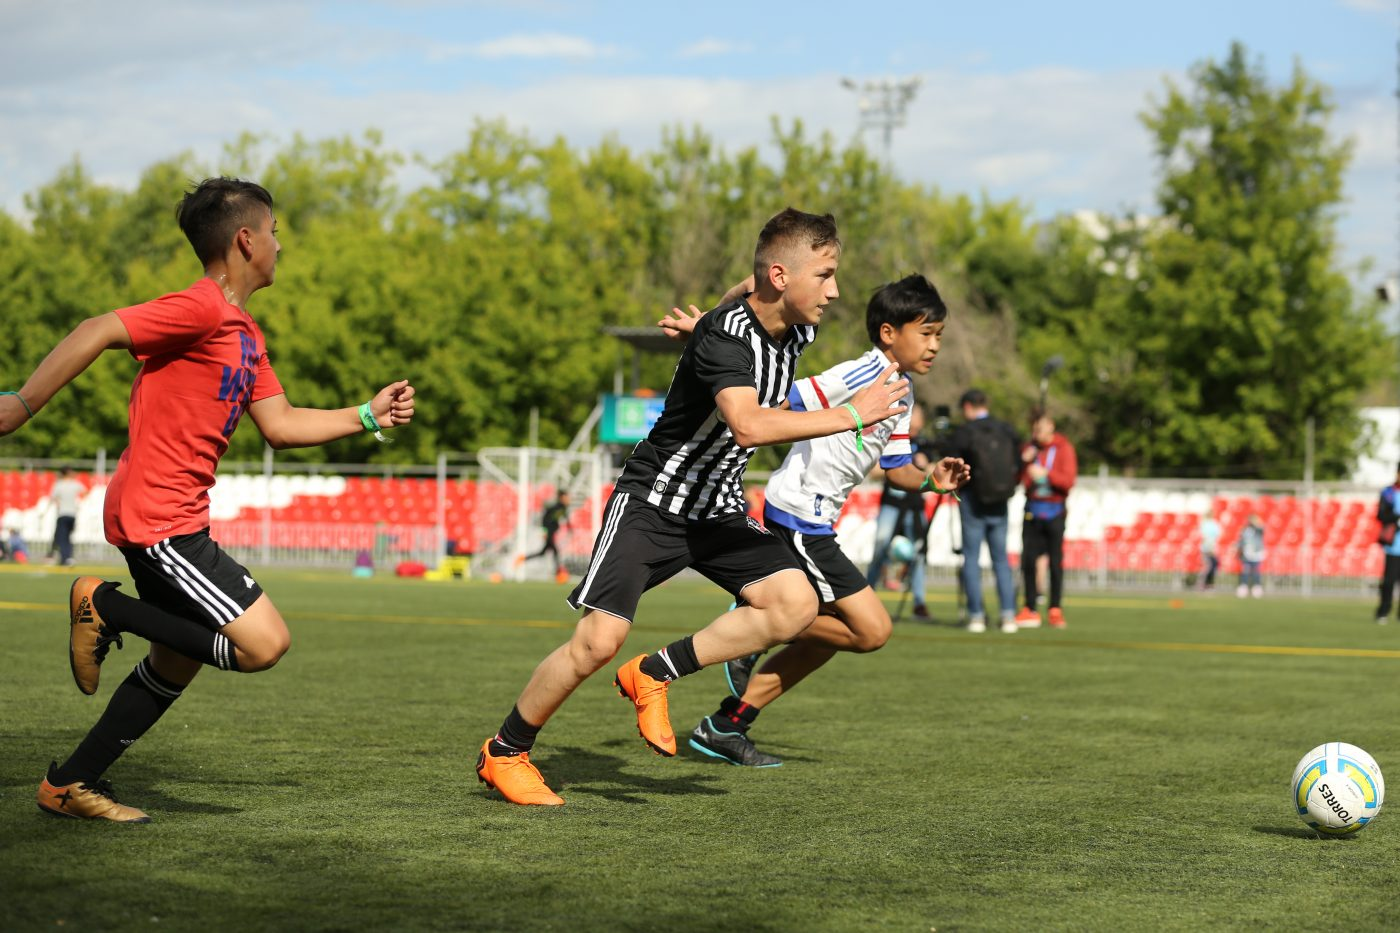 football-pour-amitie-programme-uefa-fifa-gazprom-4